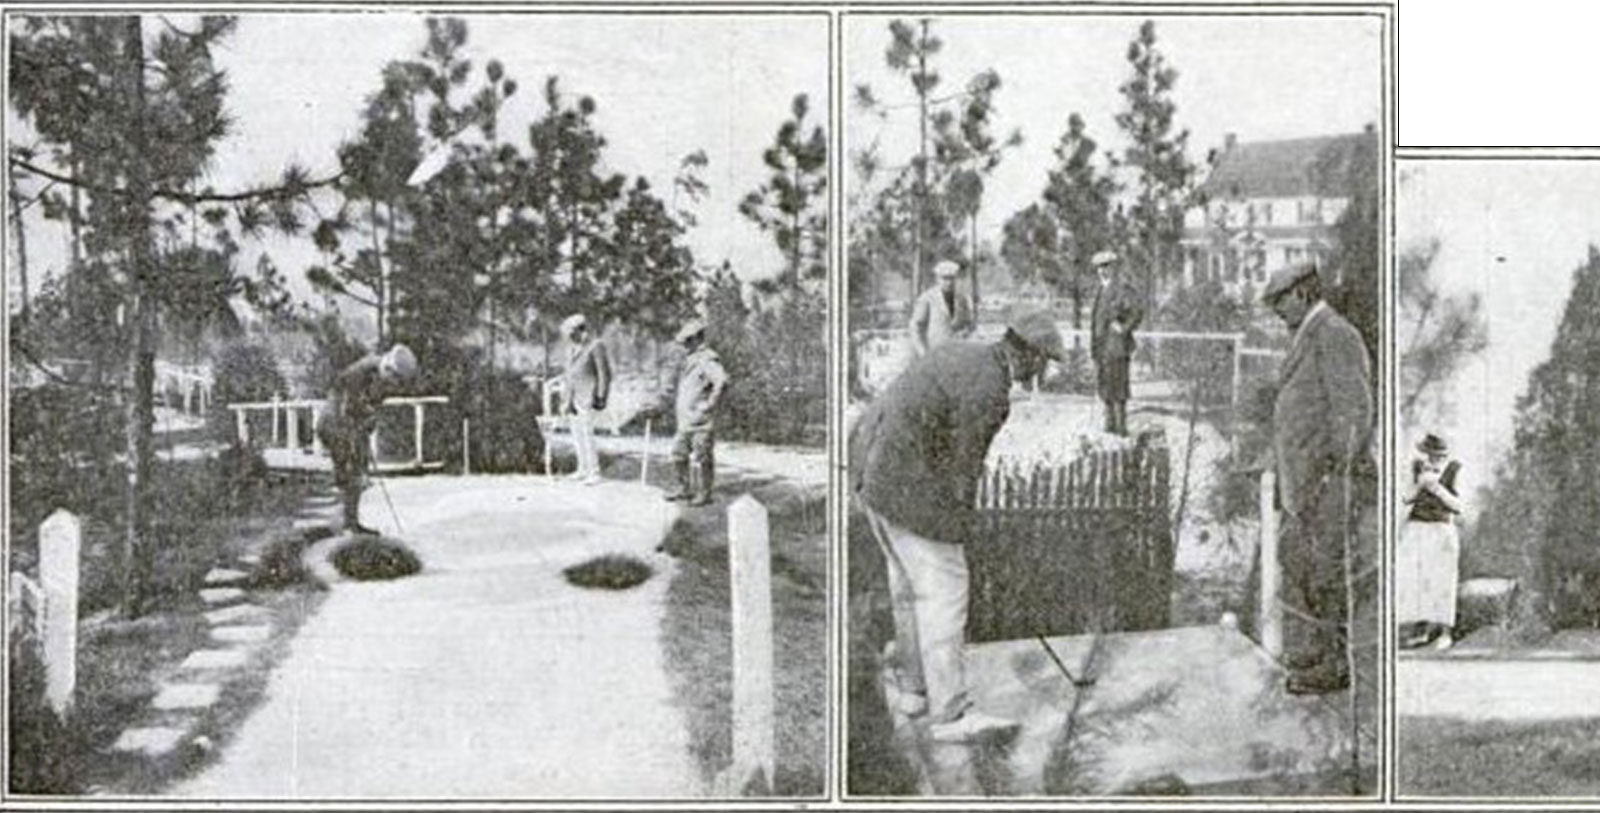 Image of Thistle Dhu Golf Course, Pinehurst Resort, 1895, Member of Historic Hotels of America, Pinehurst, North Carolina, History Mystery